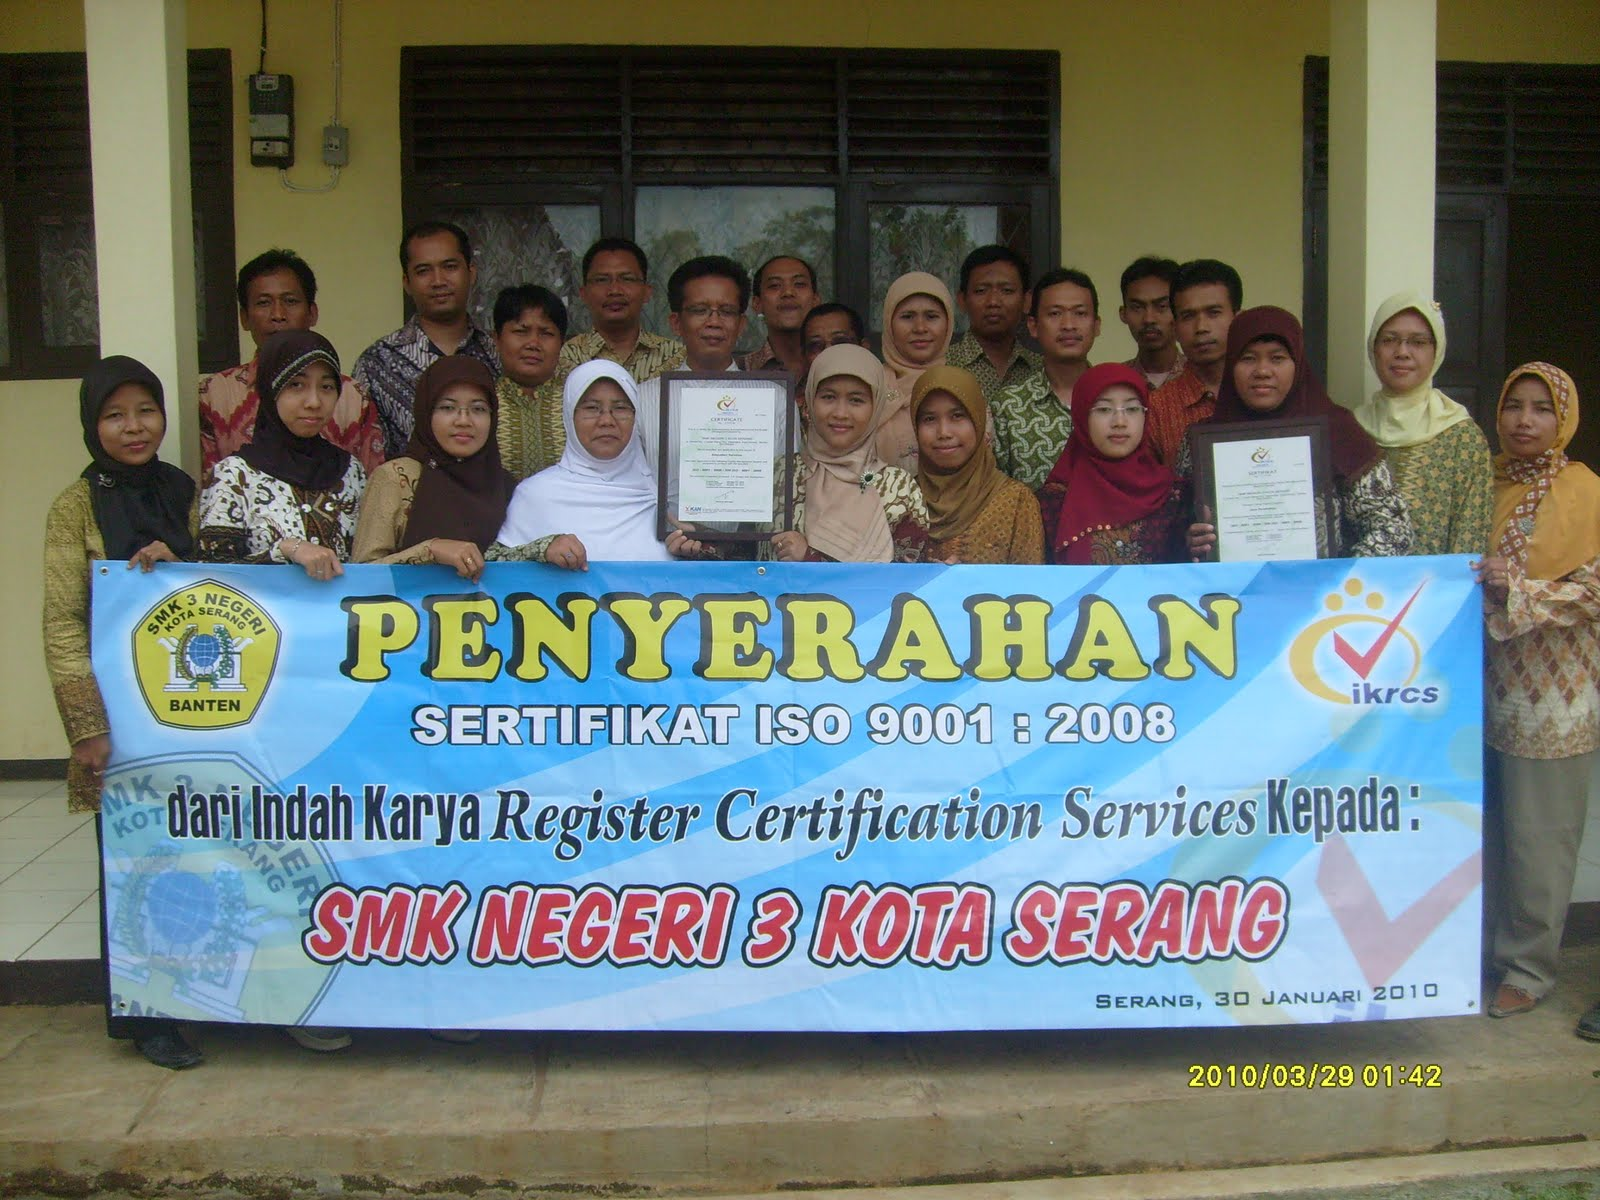 Smk Negeri 3 Kota Serang 2010